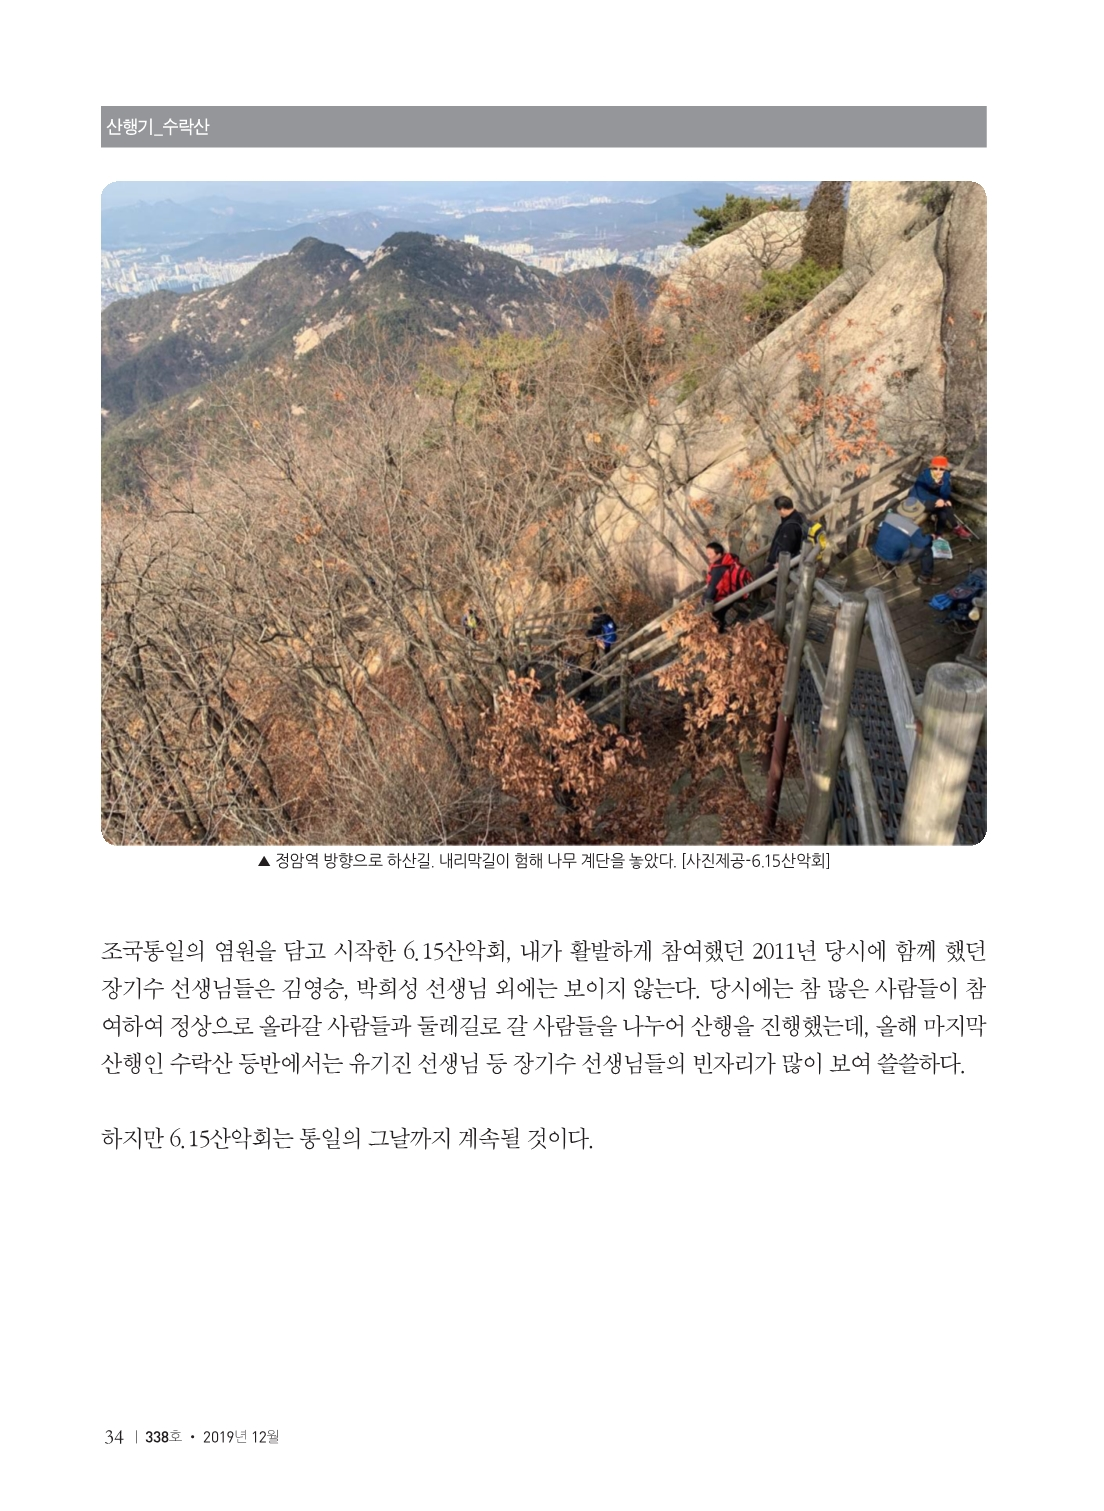 5802db1f-6a90-451c-ac2e-da2a23bee939.pdf-0036.jpg